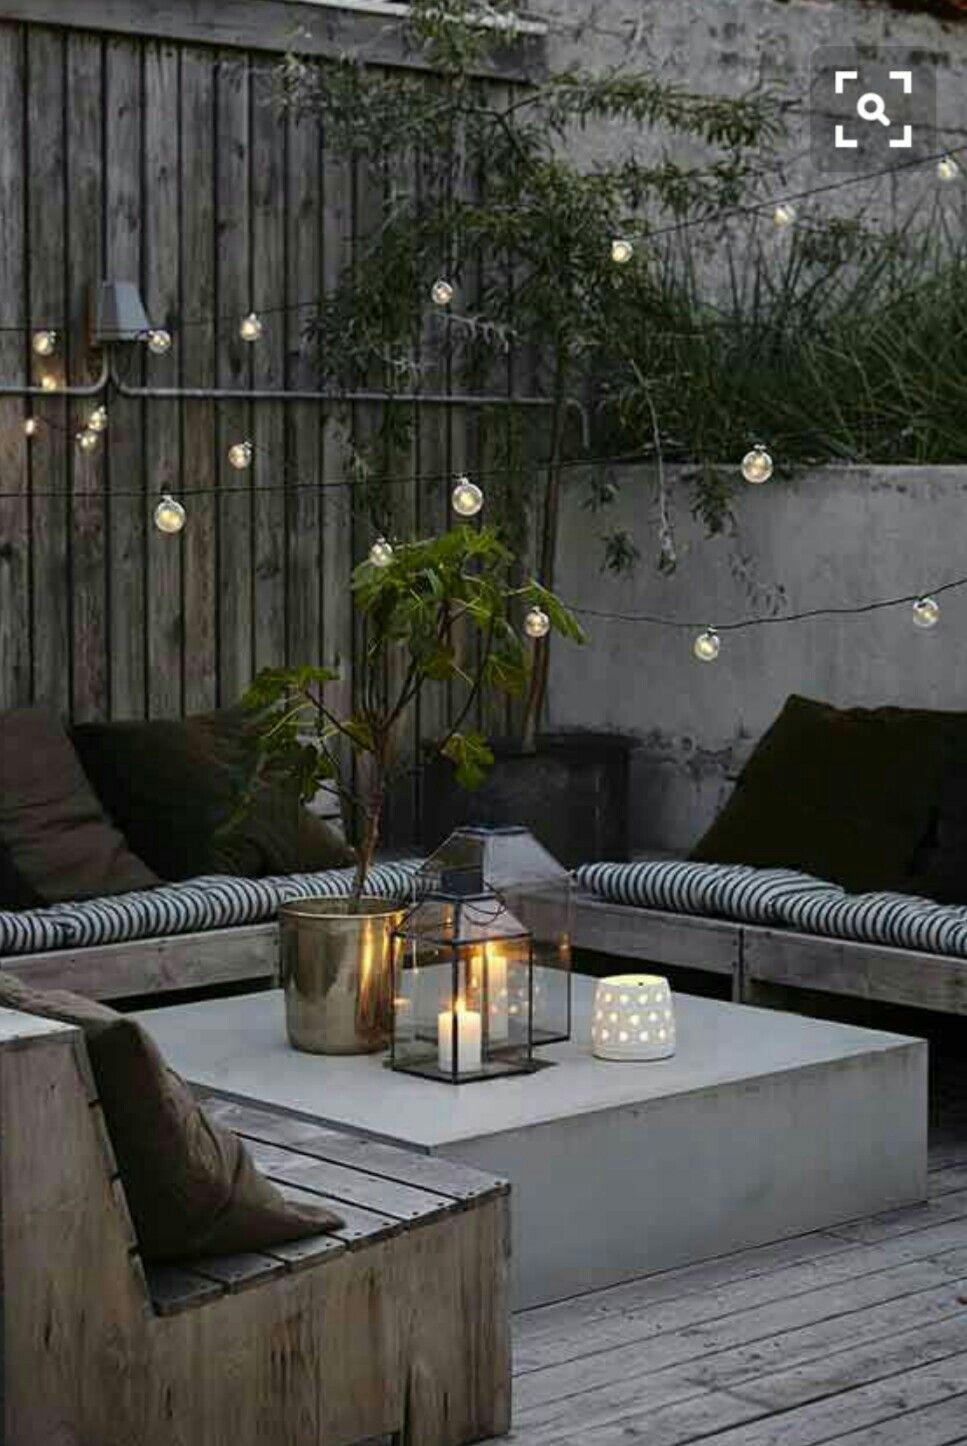 Summer Style!! Cool Outdoor Garden Seating Area! Gray, Black ... concernant Piscine Zodiac Occasion